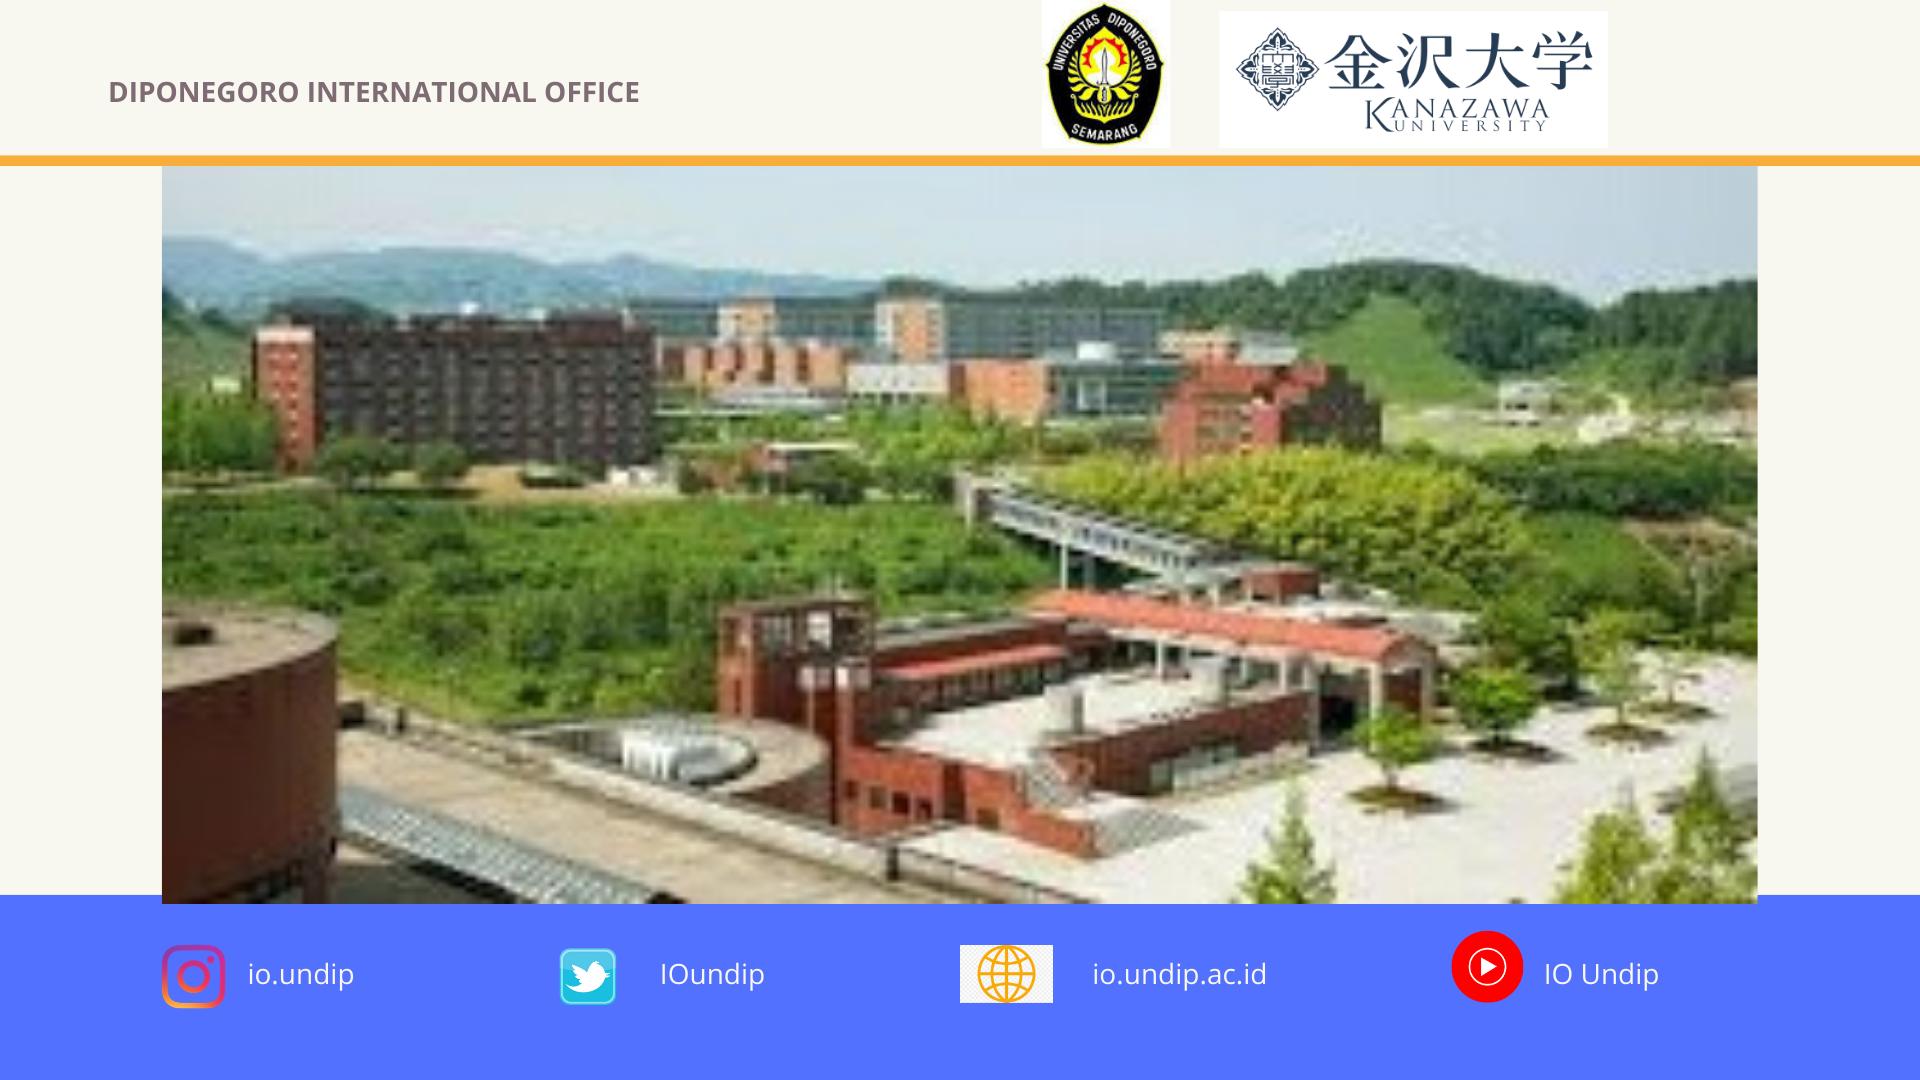 [call for application] Kanazawa University_Call for Short-Stay Program 2020-2021